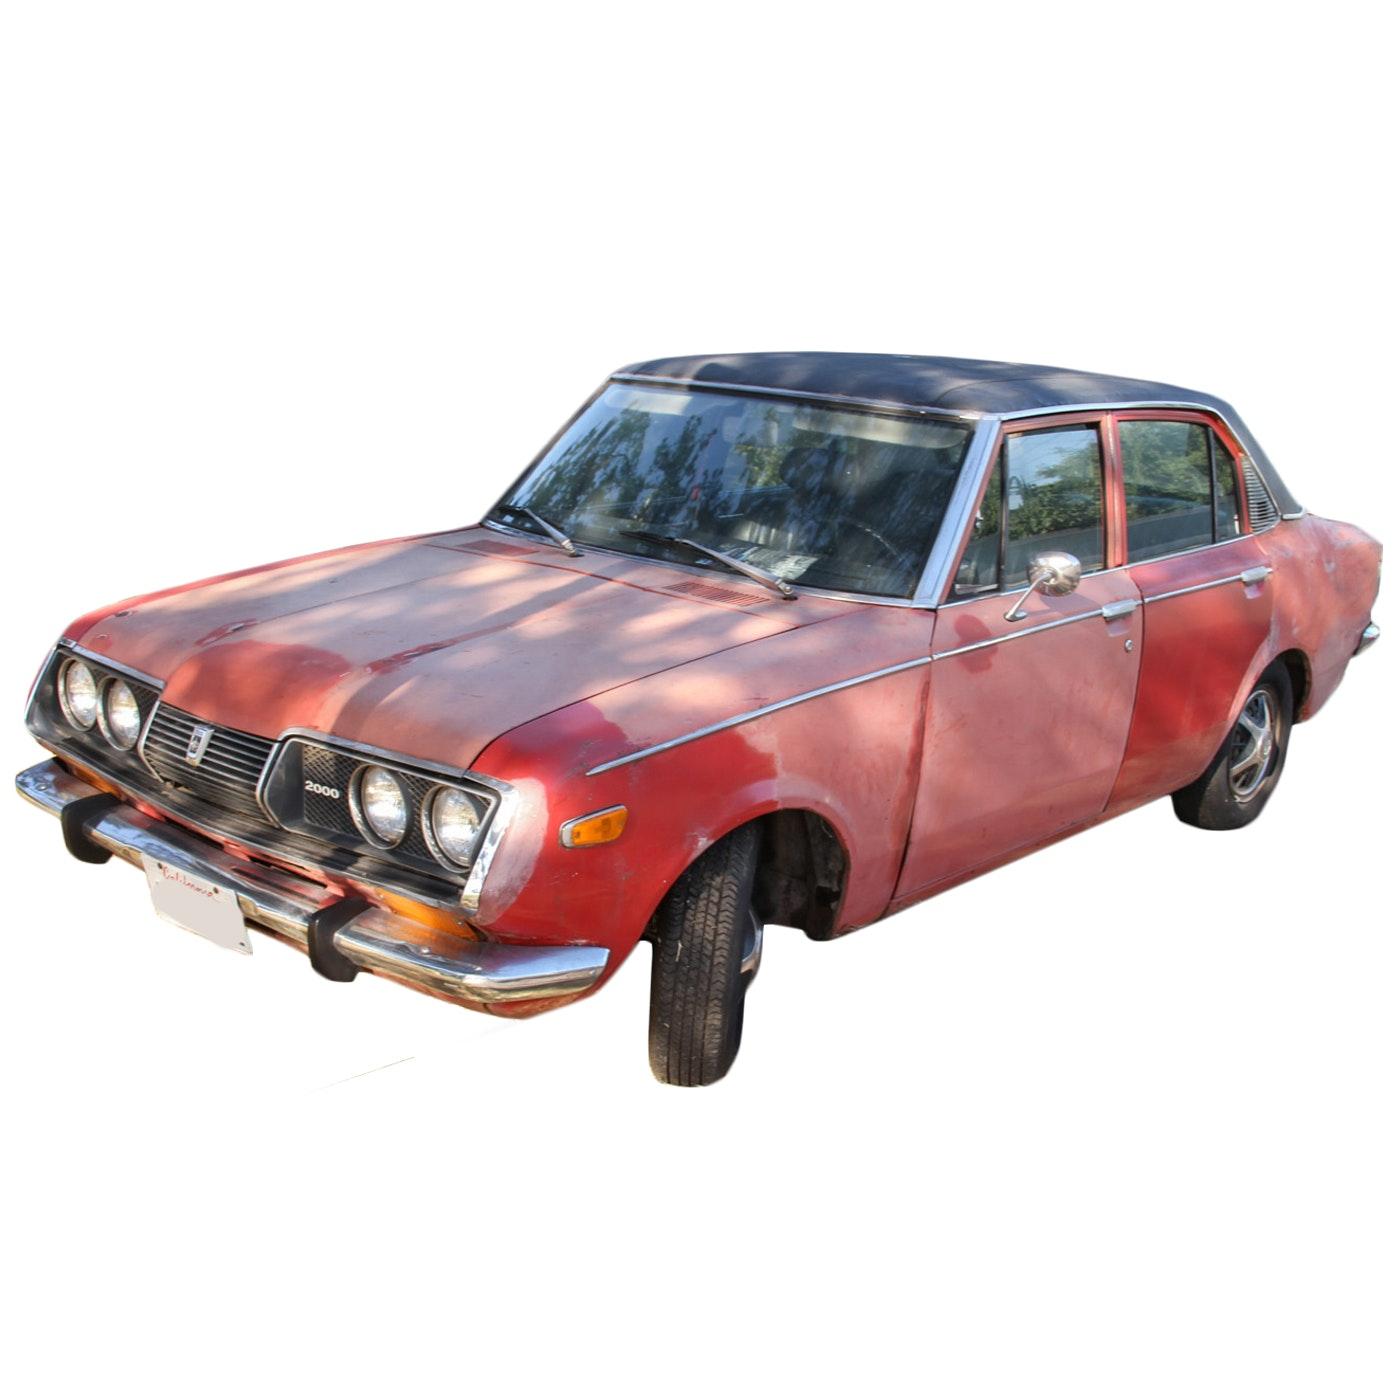 1972 Toyota Corona Mark II Sedan